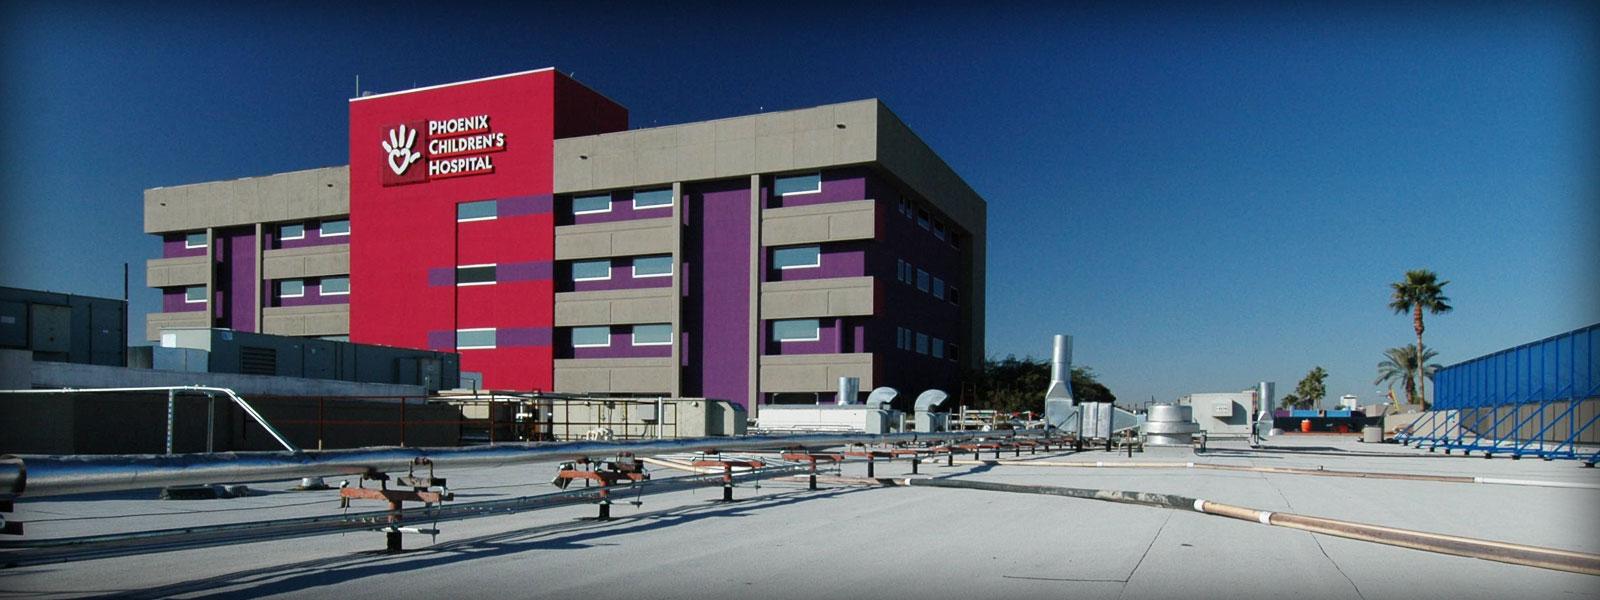 phoenixchildrenshospital